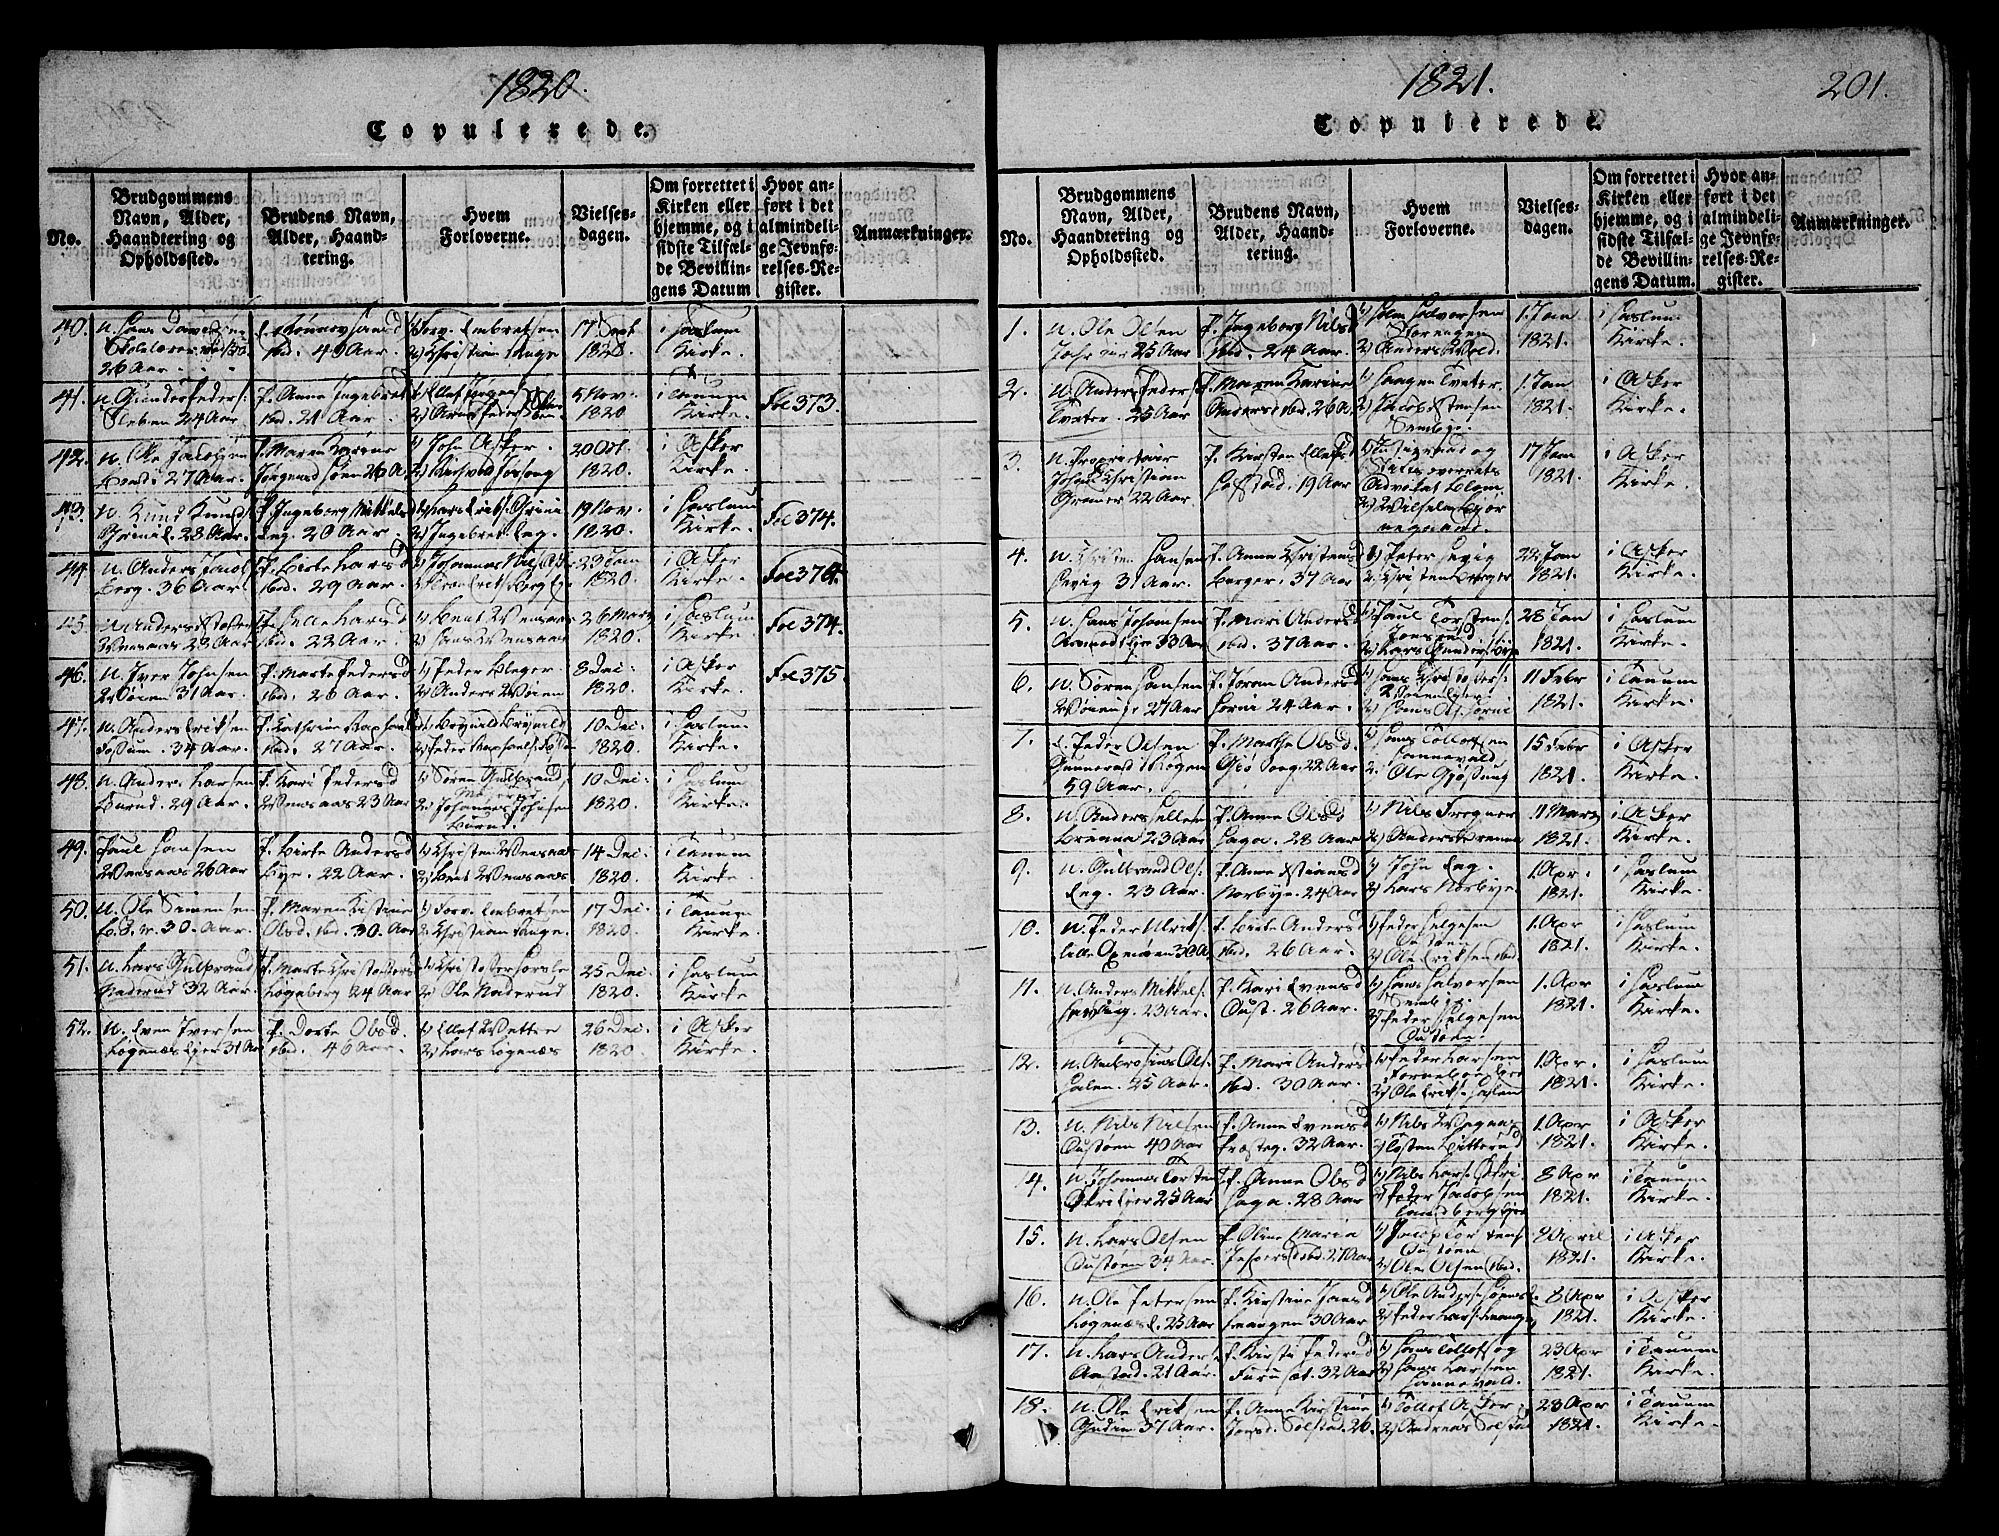 SAO, Asker prestekontor Kirkebøker, G/Ga/L0001: Klokkerbok nr. I 1, 1814-1830, s. 201